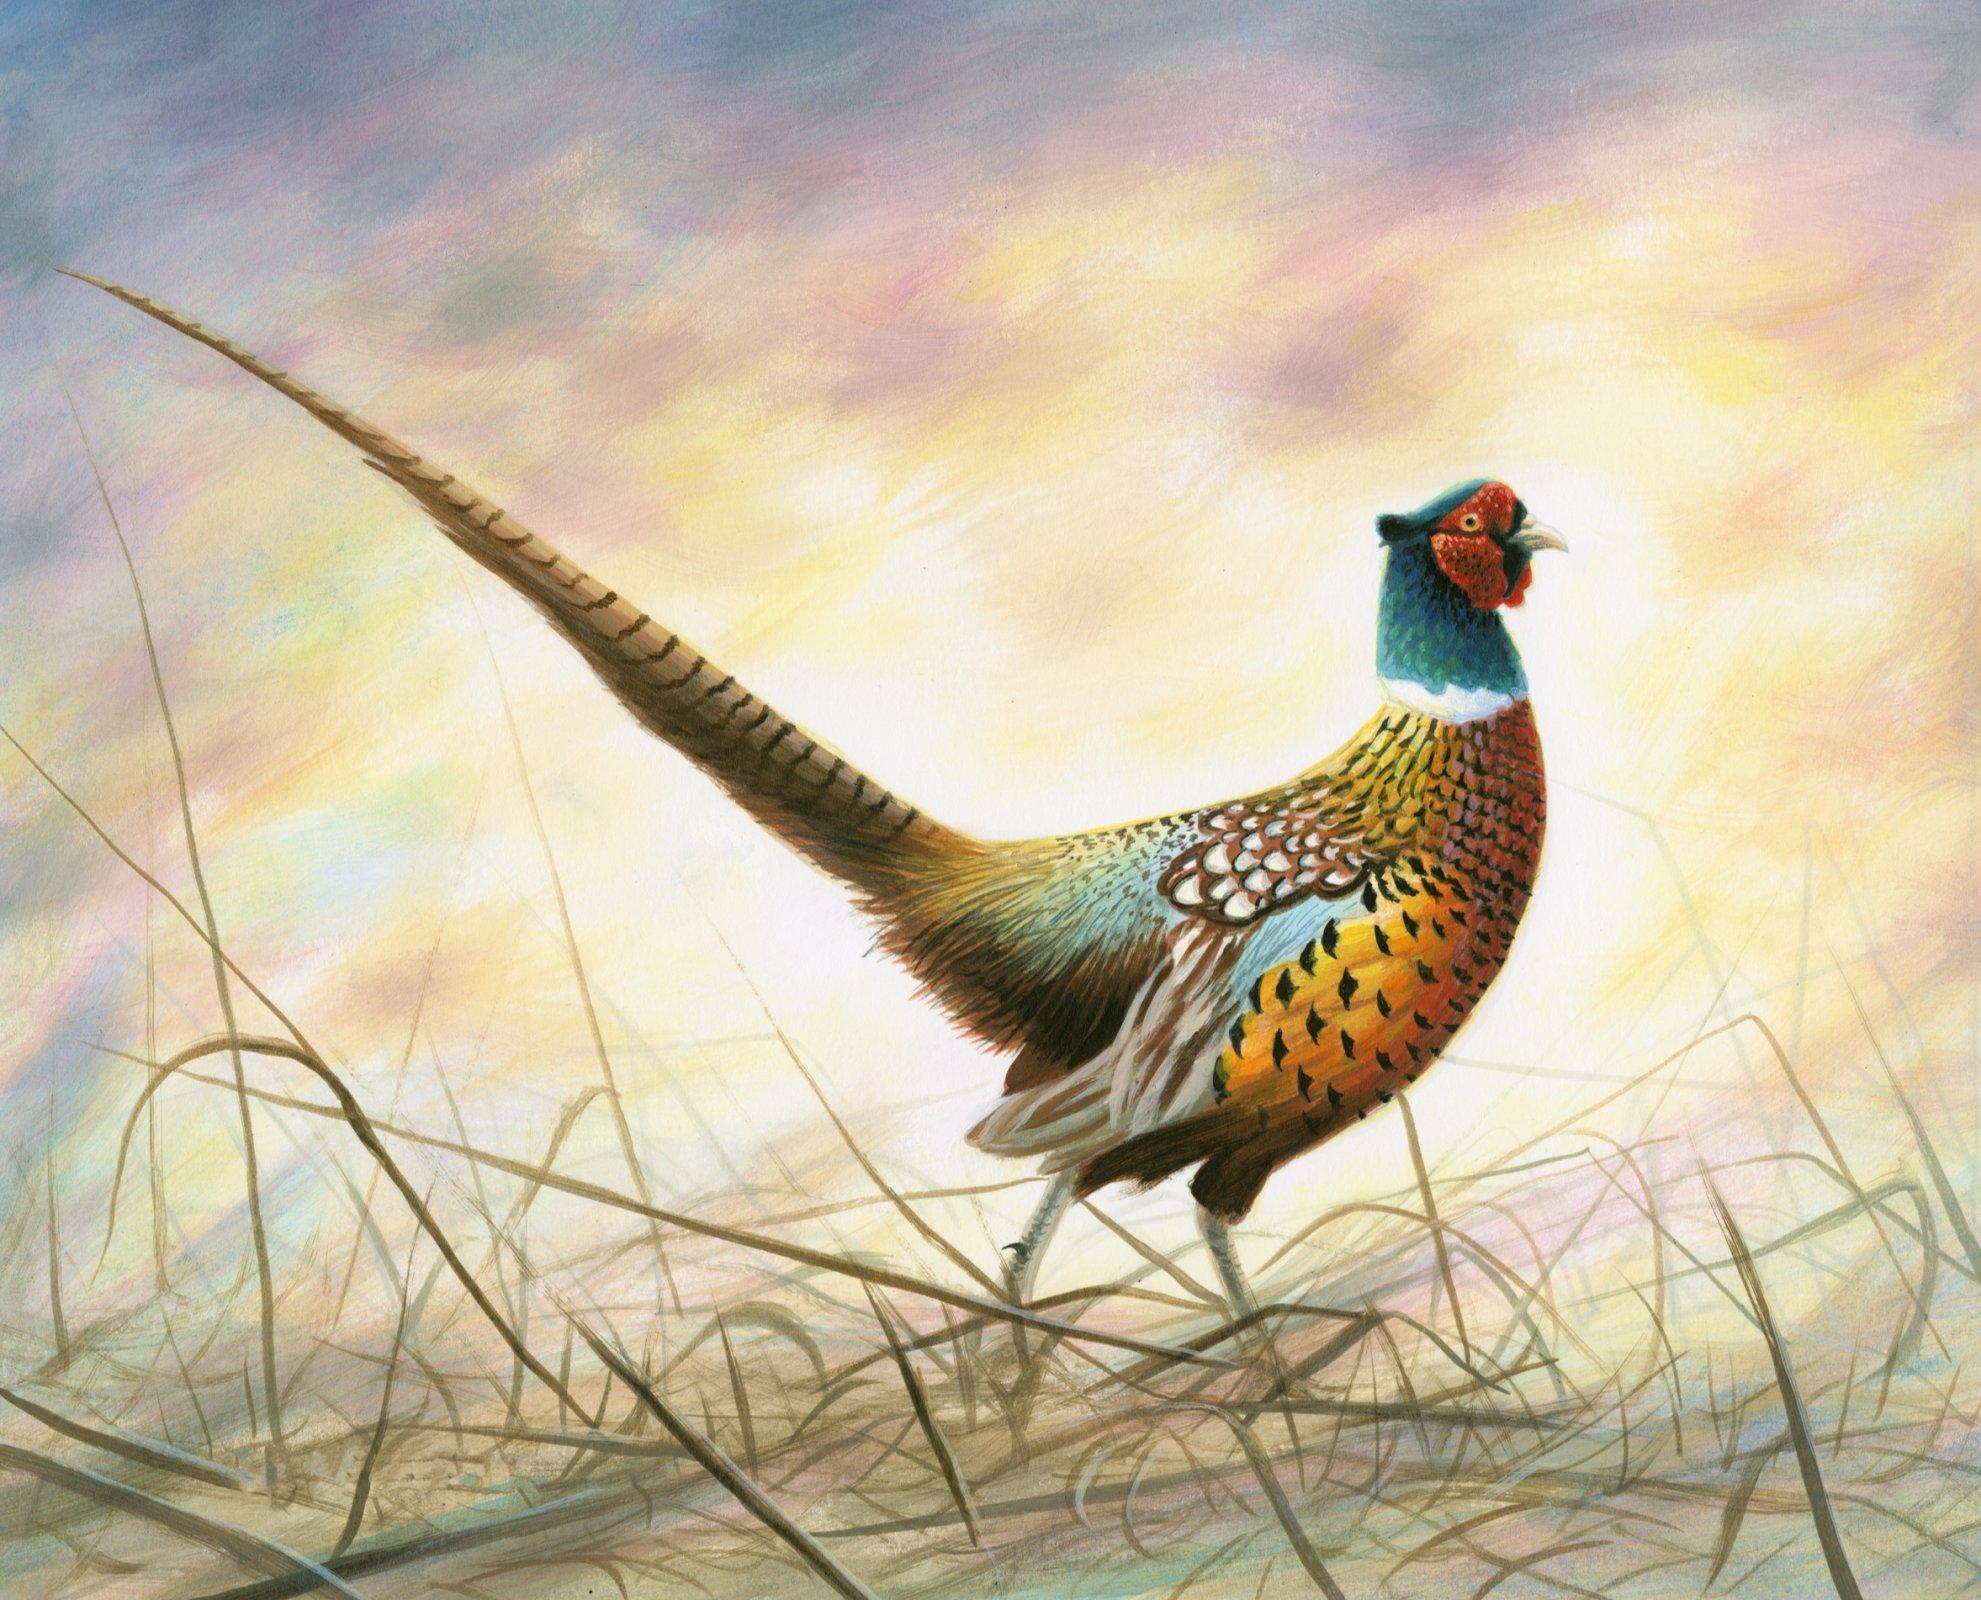 DT-Exclusive Digital Prints AL-3861-1 Spring Rooster Pheasant Panel